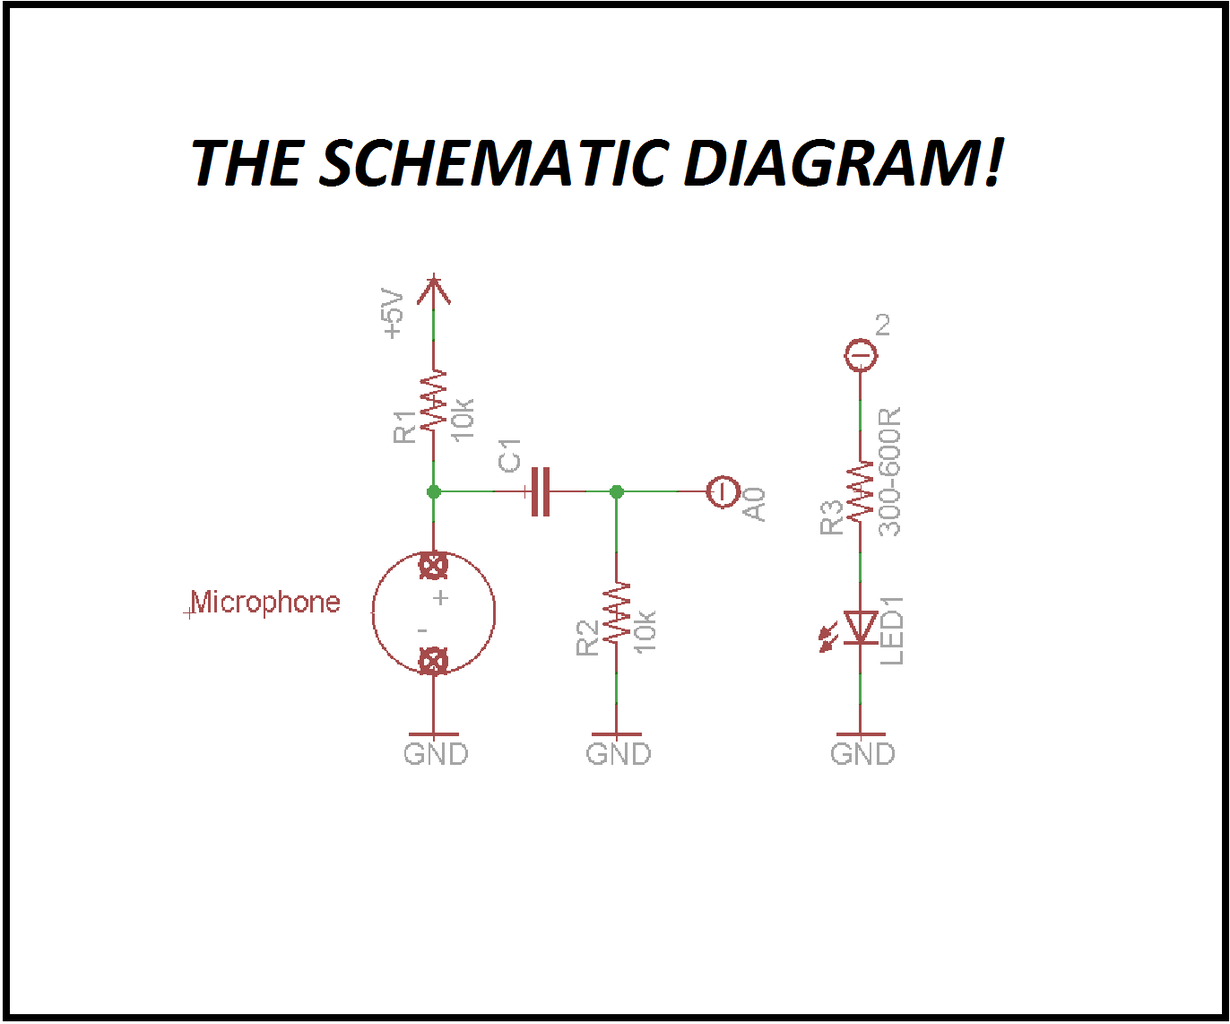 The Schematic Diagram!